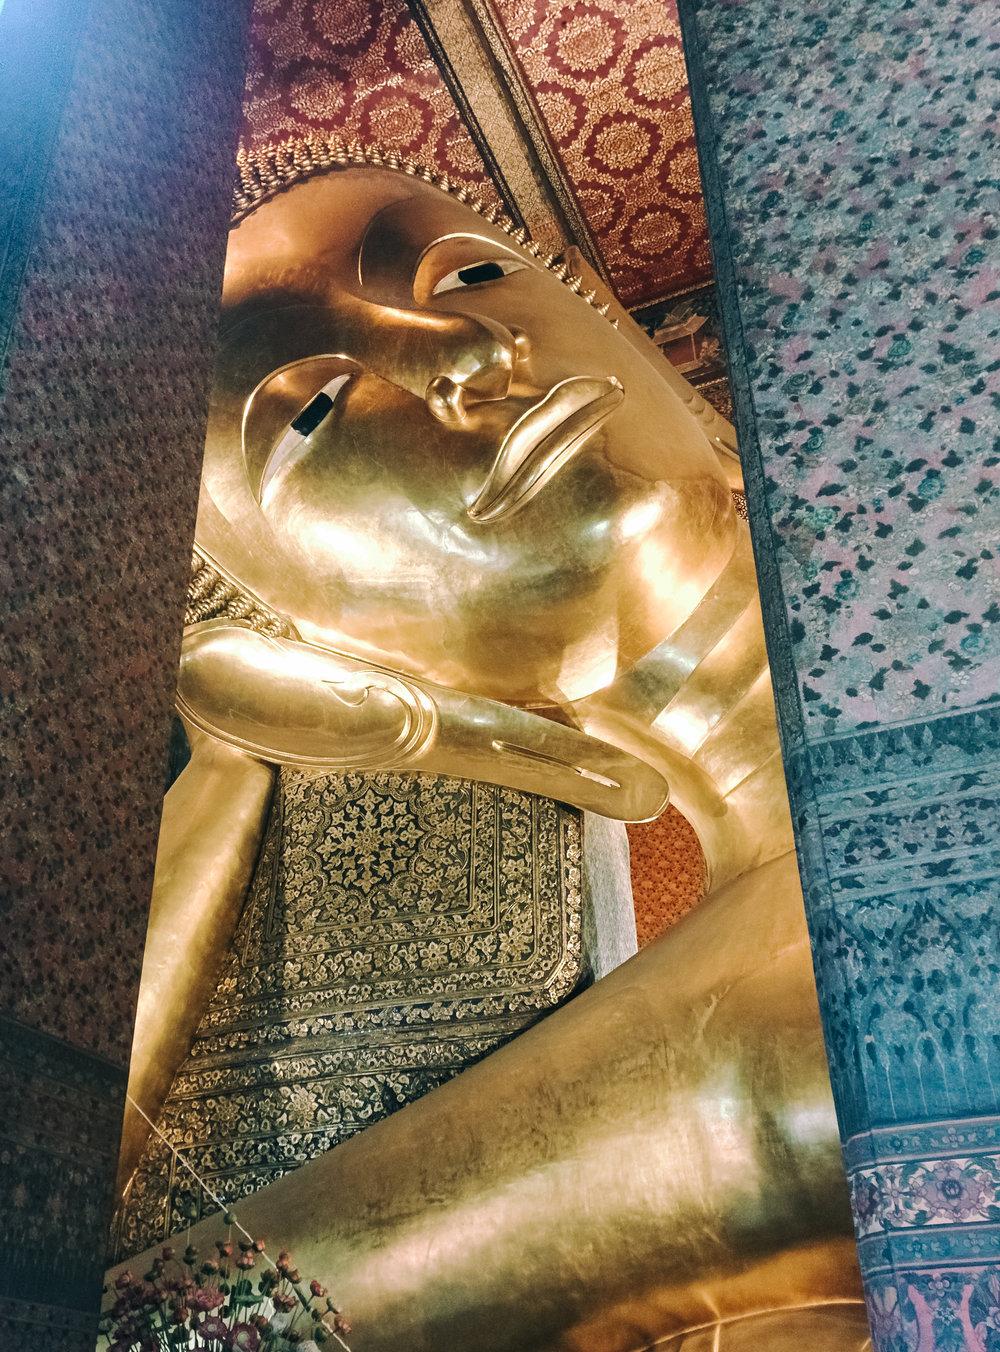 Wat Pho - 2 Sanamchai Road, Grand Palace Subdistrict, Pranakorn District, Bangkok 10200, Thailand